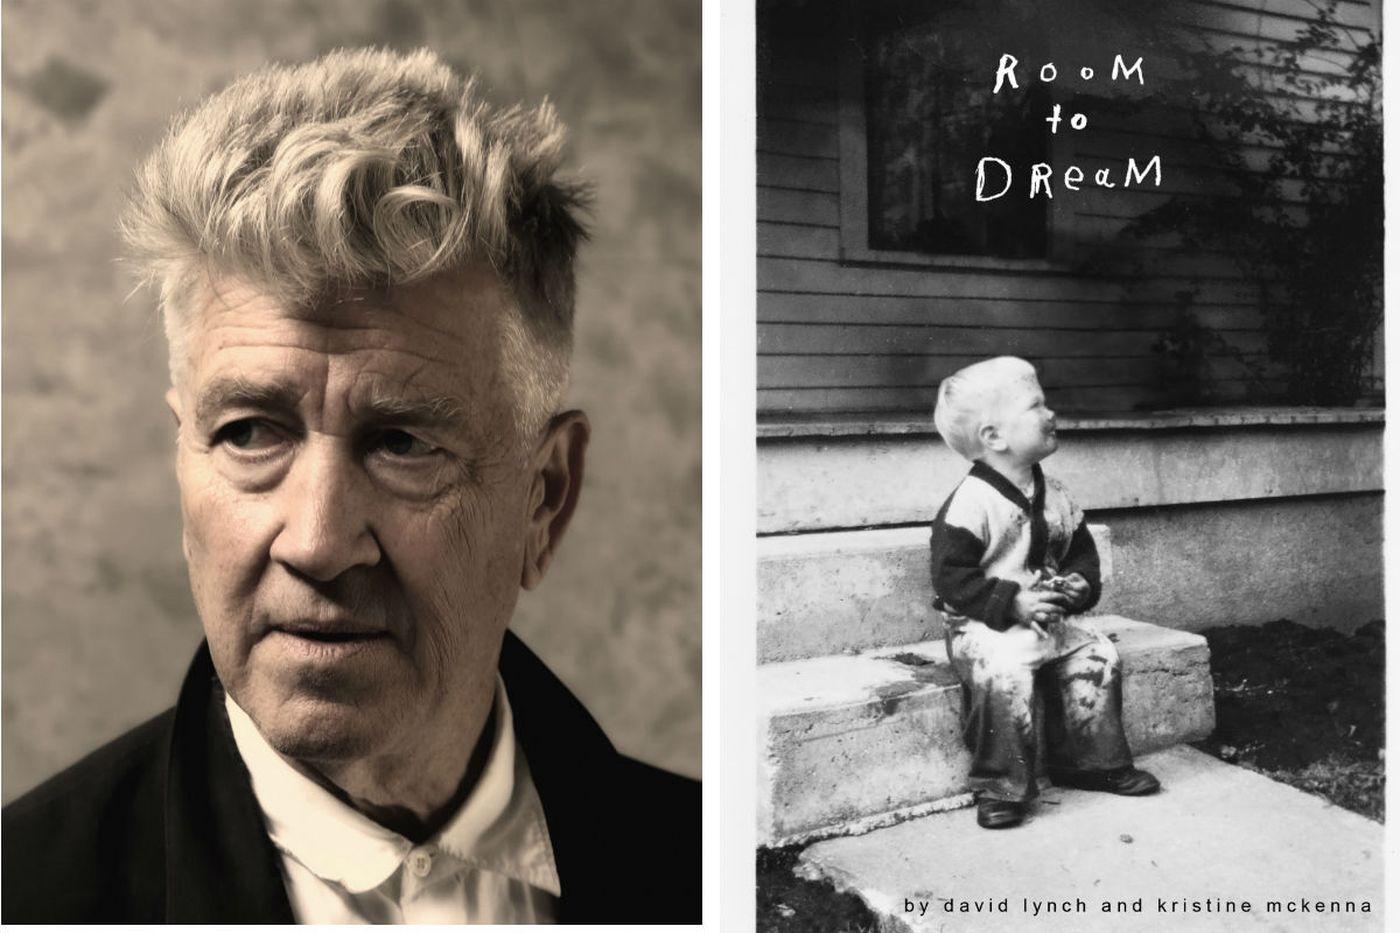 David Lynch & Kristine McKenna Room To Dream Book Review